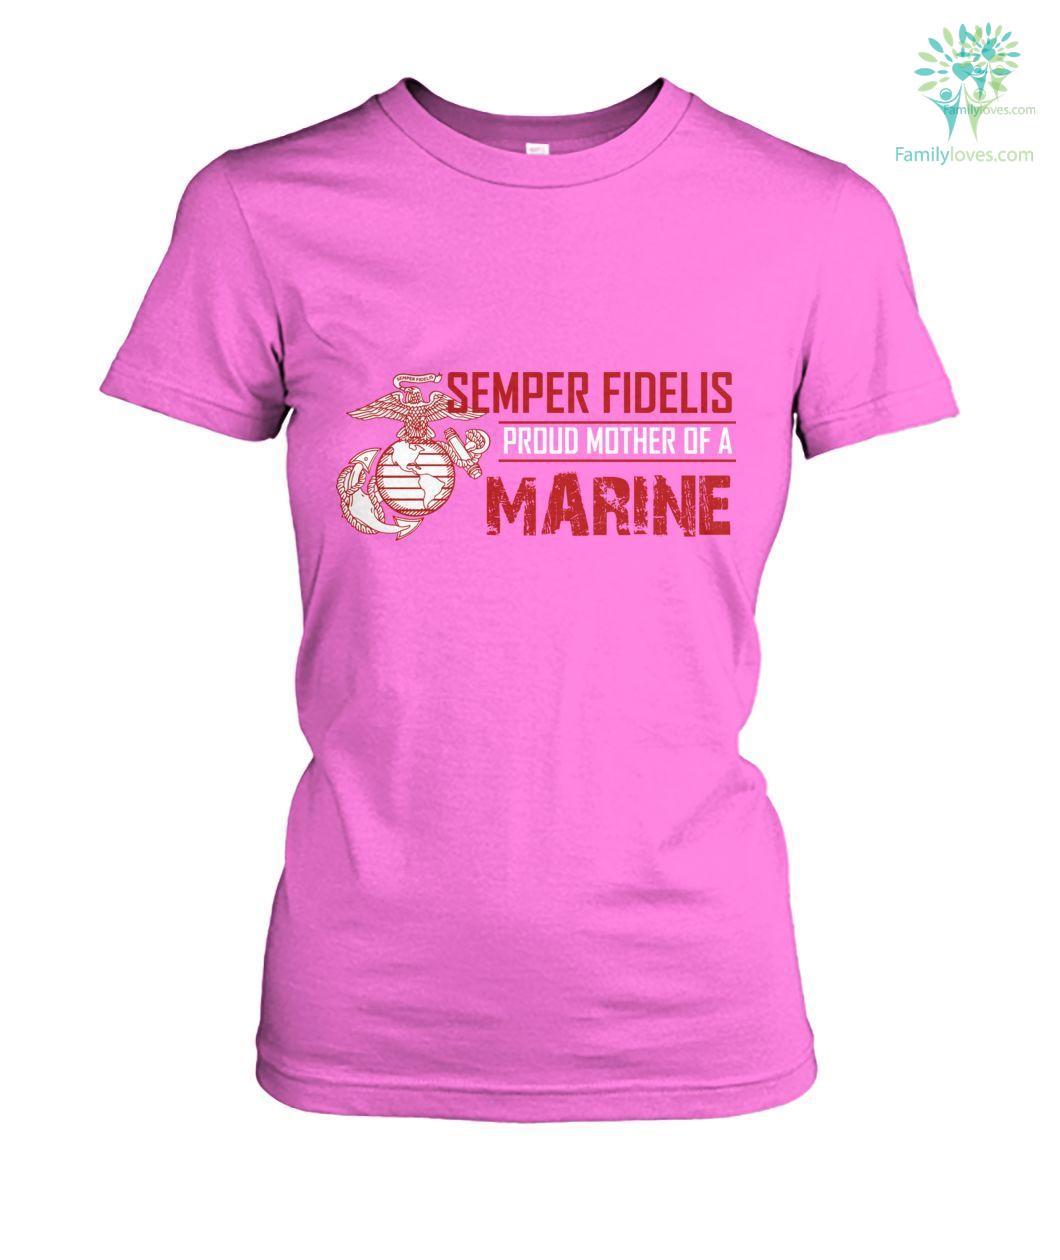 Semper fidelis proud Mother of a Marine women t-shirt, hoodie Familyloves.com